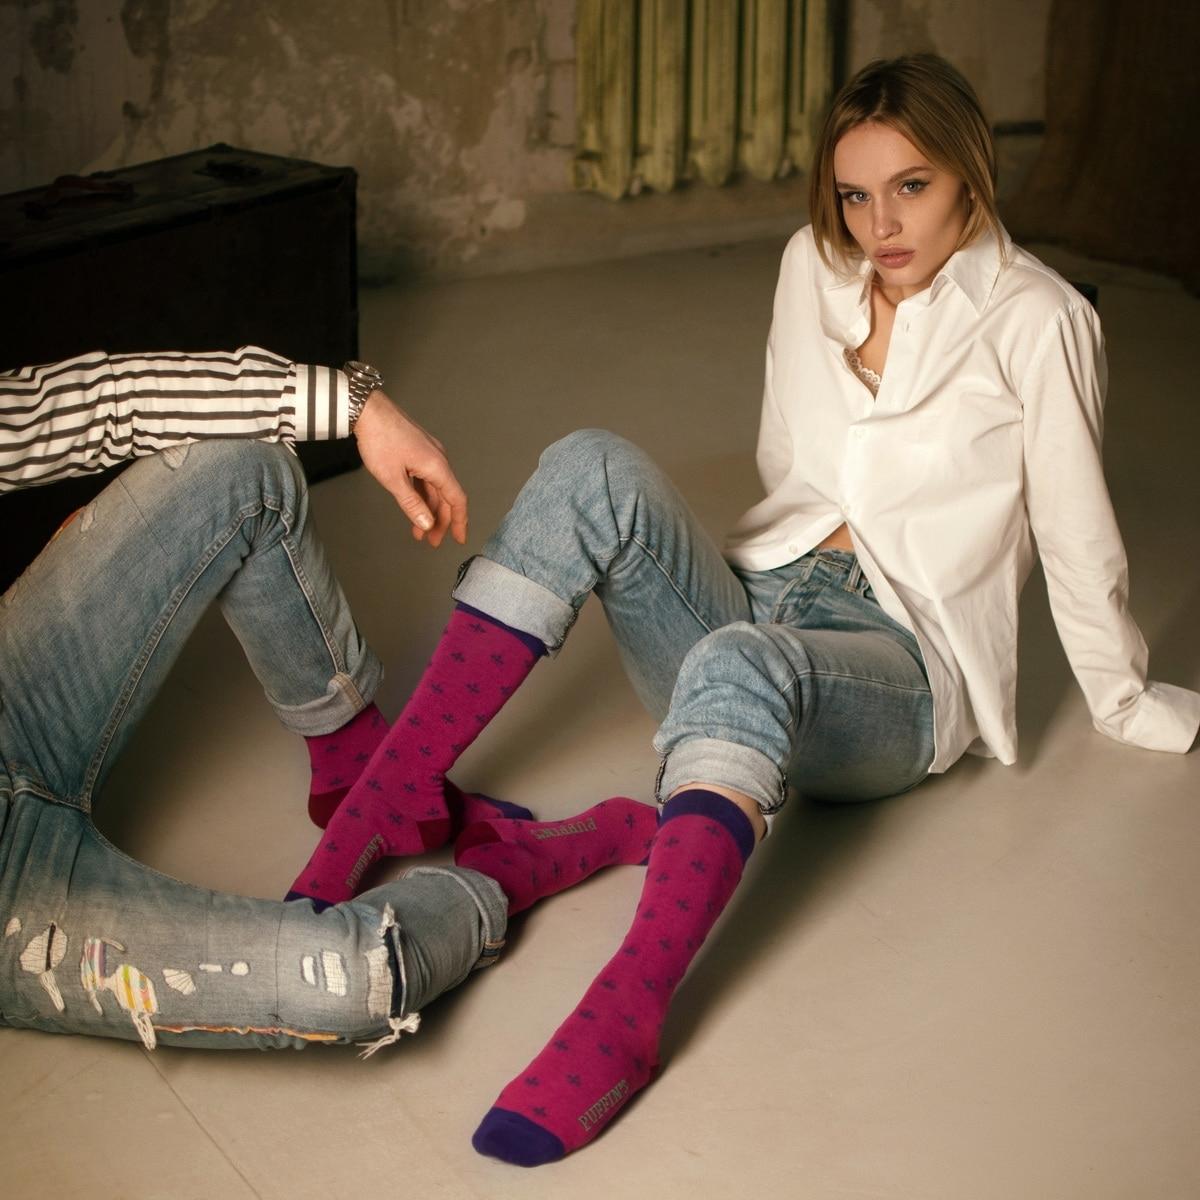 HAPPY WEEK. Set of 6 pairs colorful socks  LONG-series & gift box